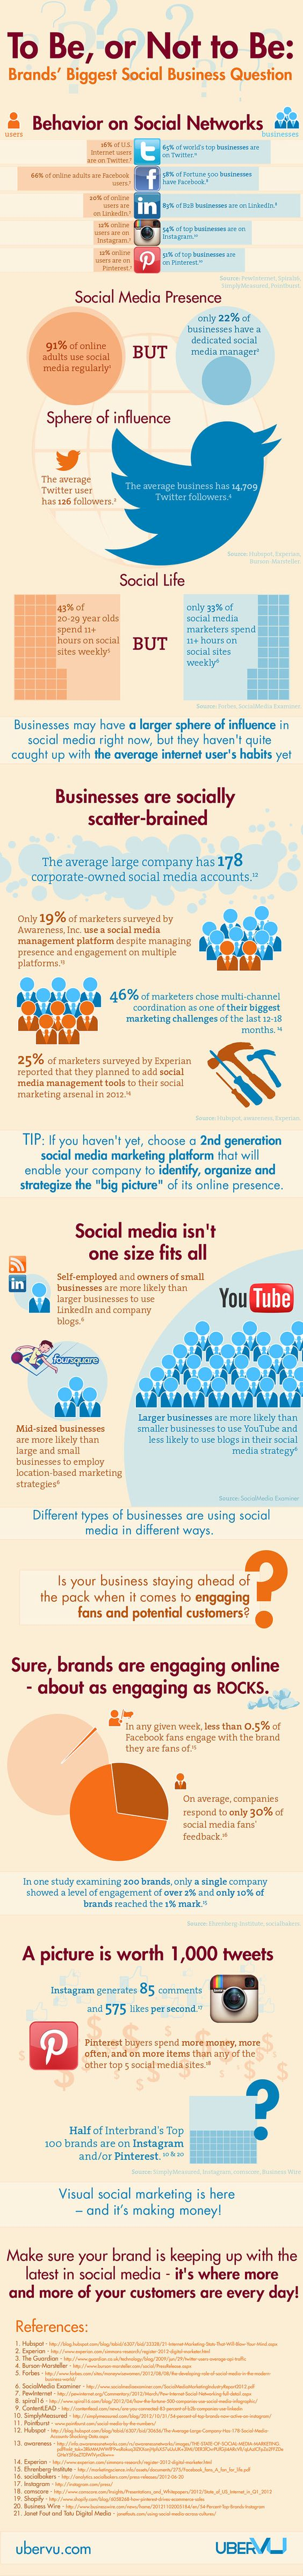 Social Media: Unternehmen haben enormen Nachholbedarf #Infografik